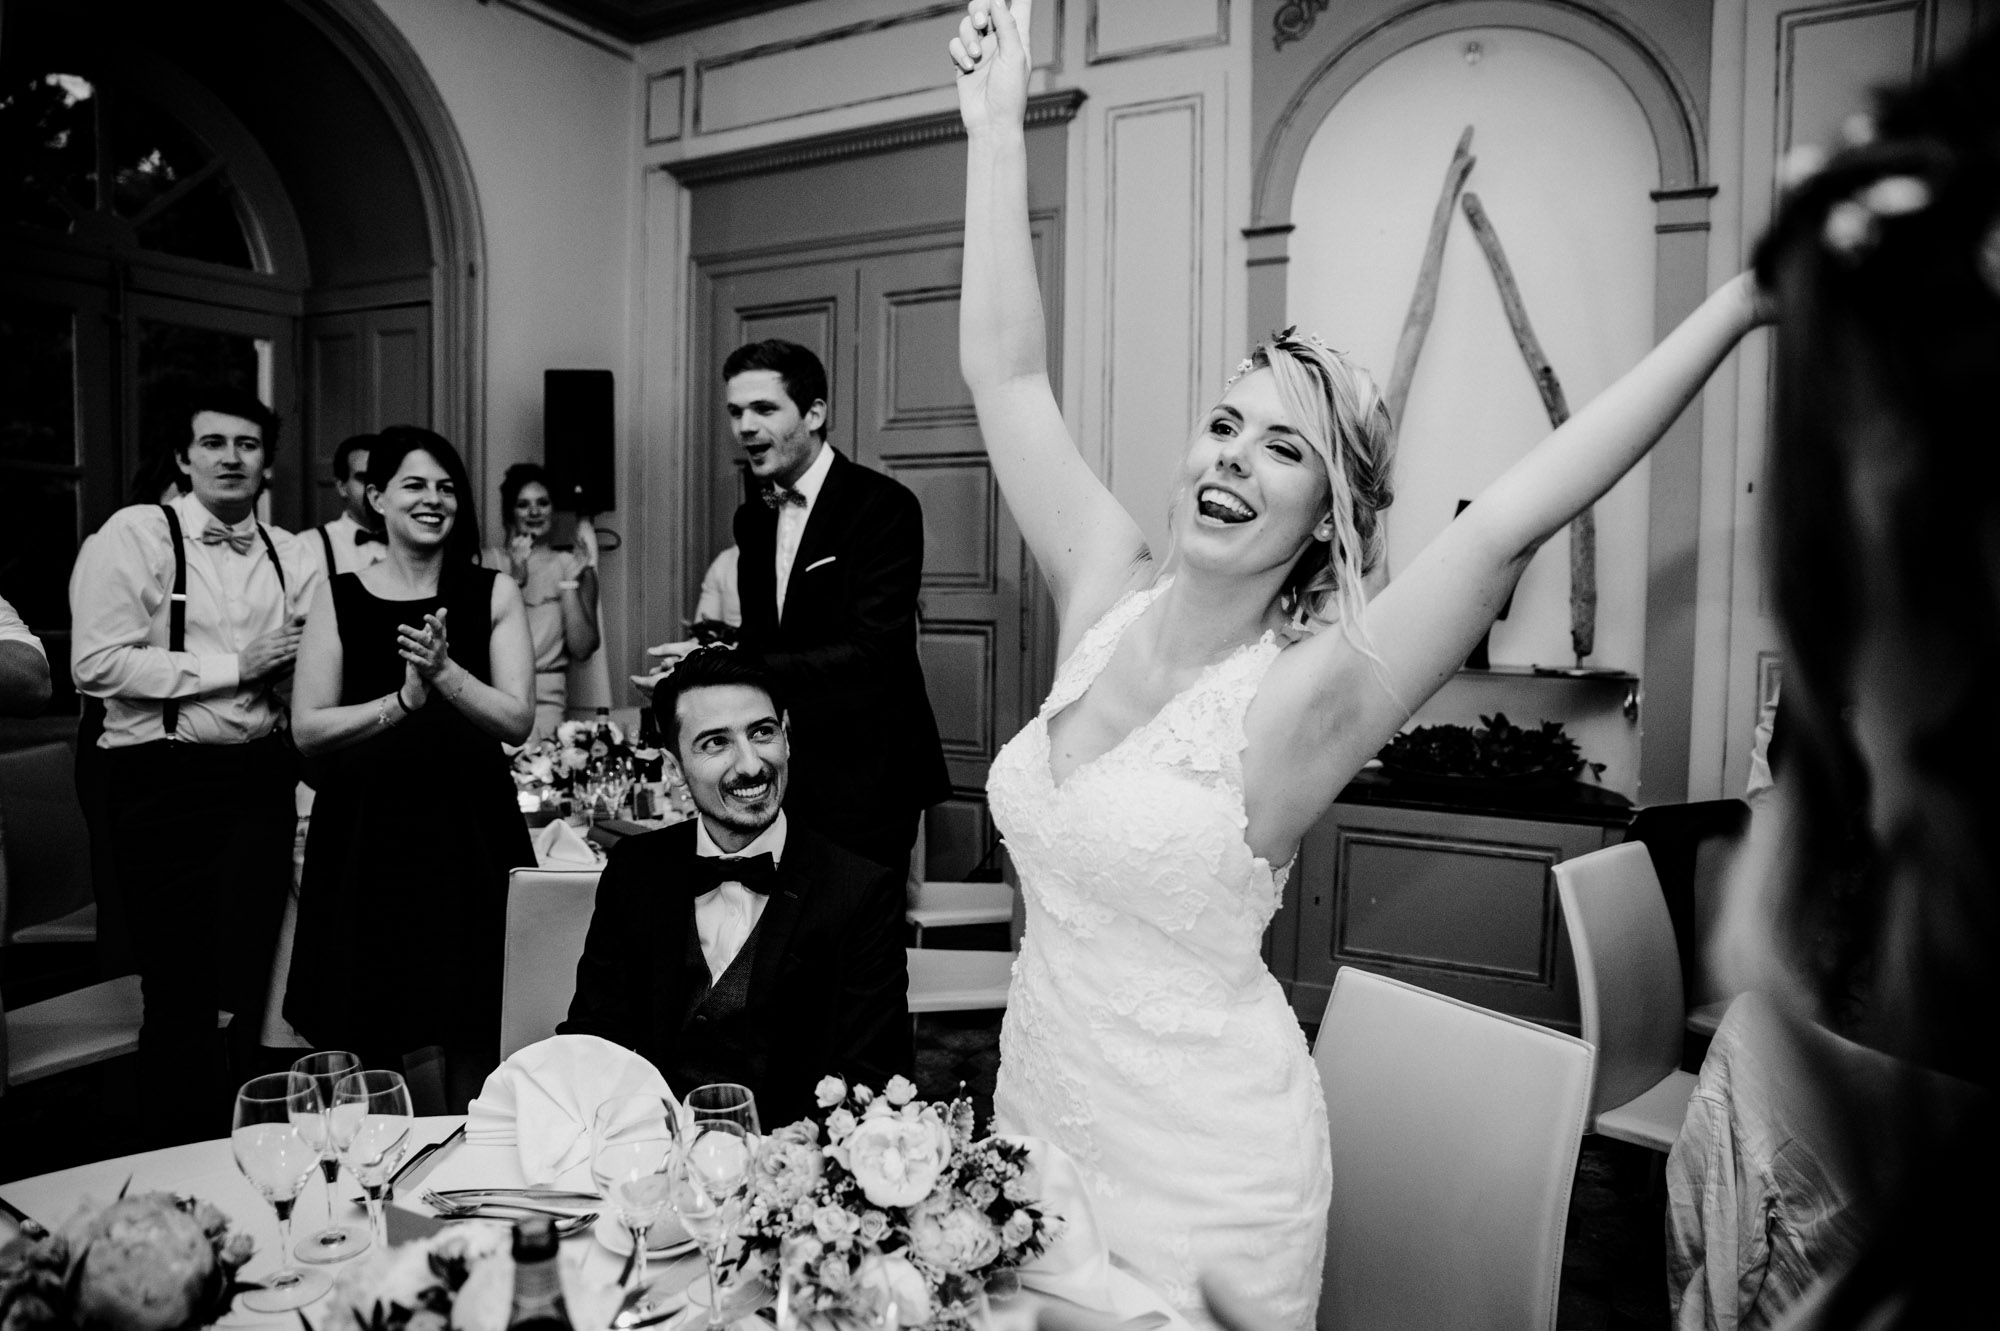 2017-06-03 - DSC_4067 - photographe - mariage - www.lauriediazwedding.com.jpg